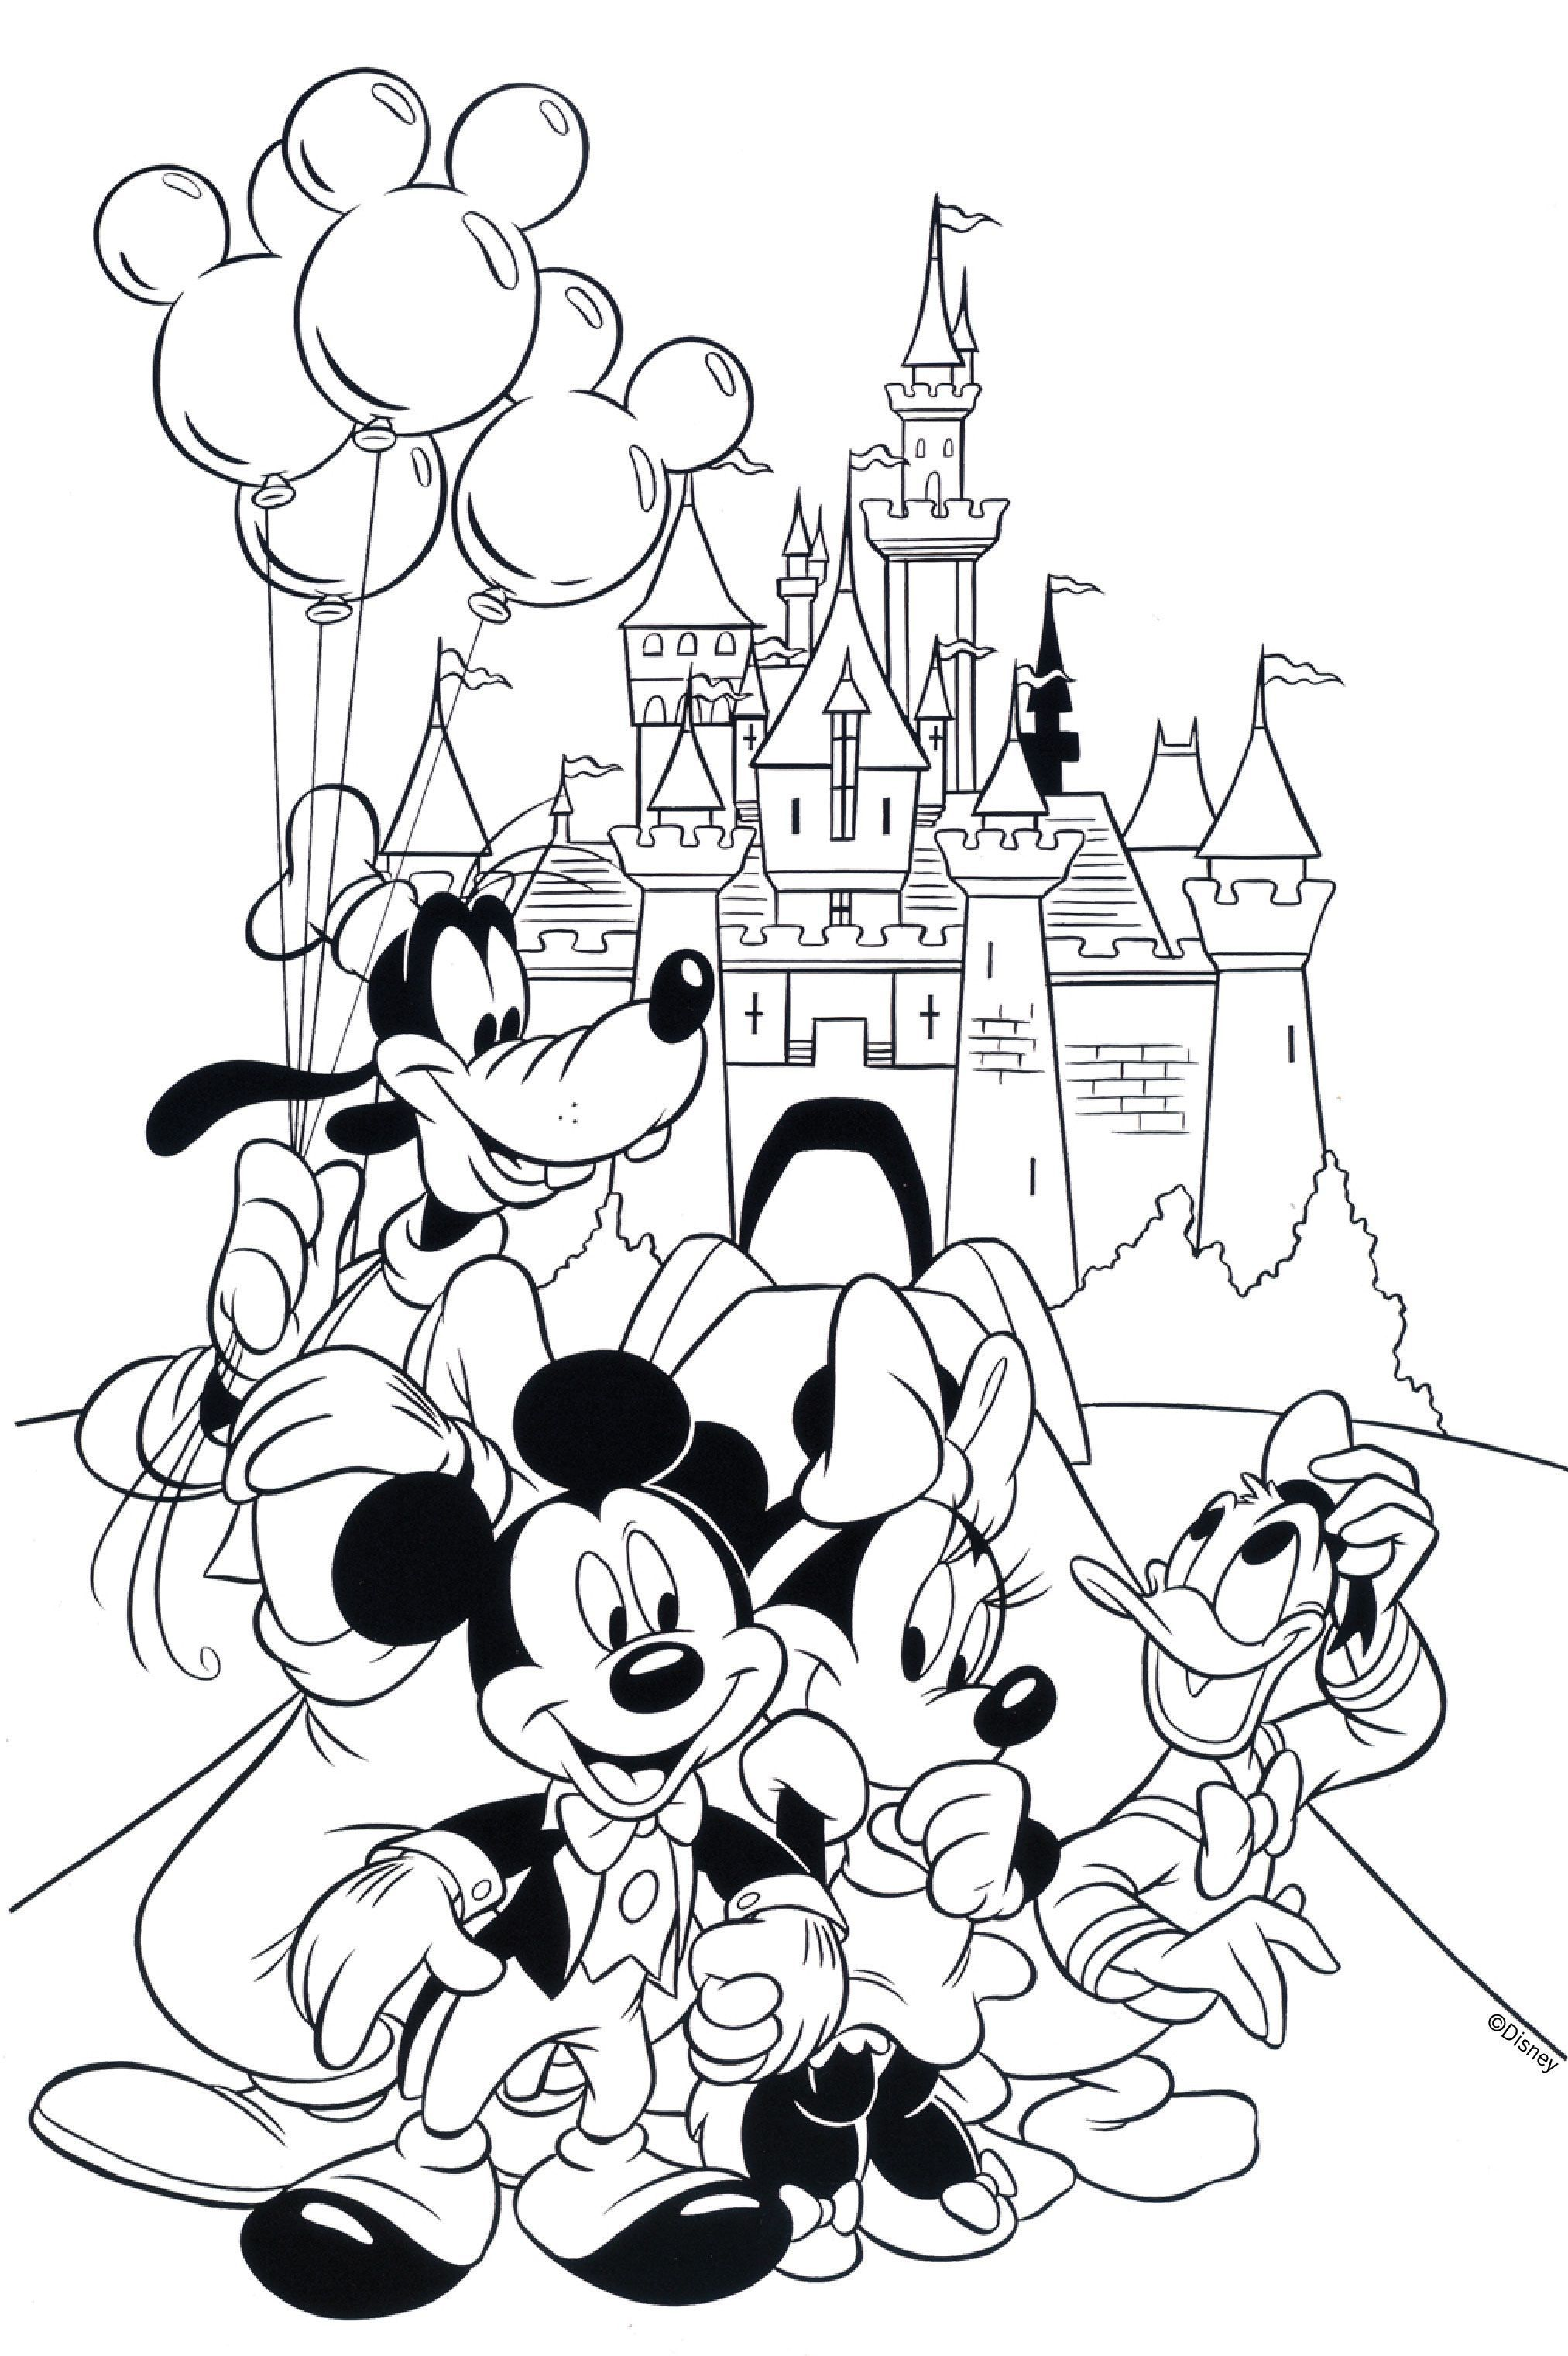 Free Disney Coloring Page Printable Disney Coloring Pages Mickey Coloring Pages Disney Coloring Sheets